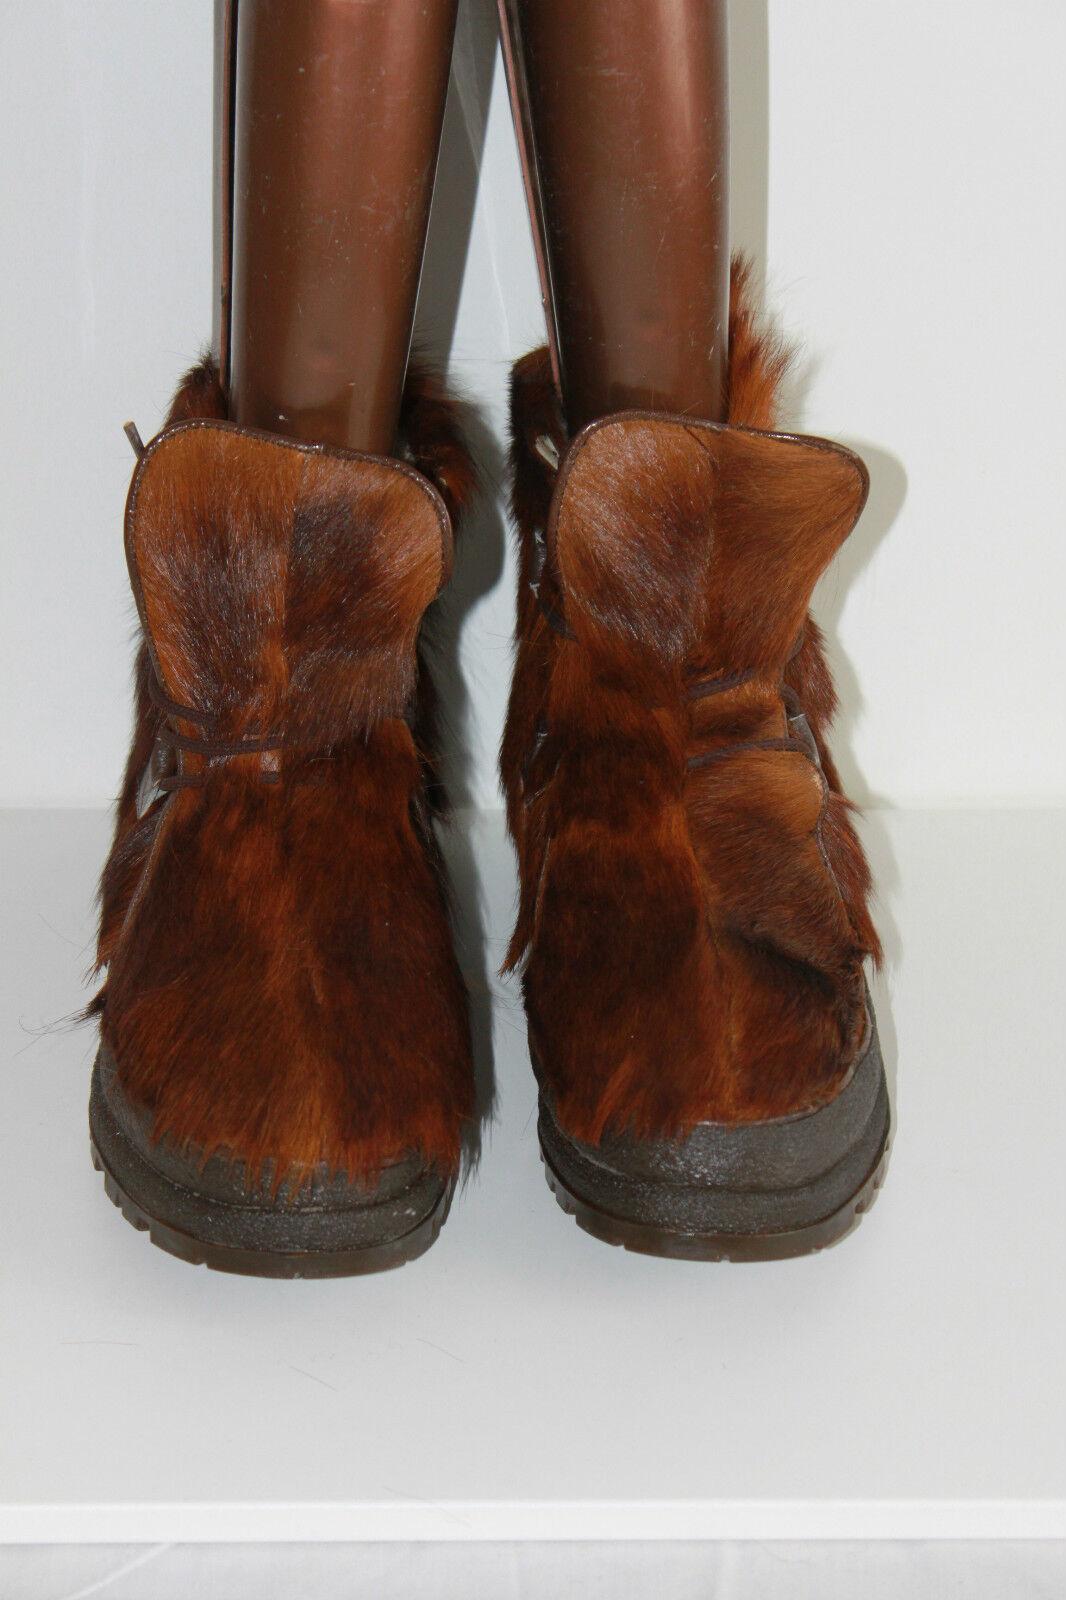 VINTAGE Stiefel Pelz gefüllt VALLOIRE Pelz Stiefel Ziege T 41 seht guter Zustand a1e2fc